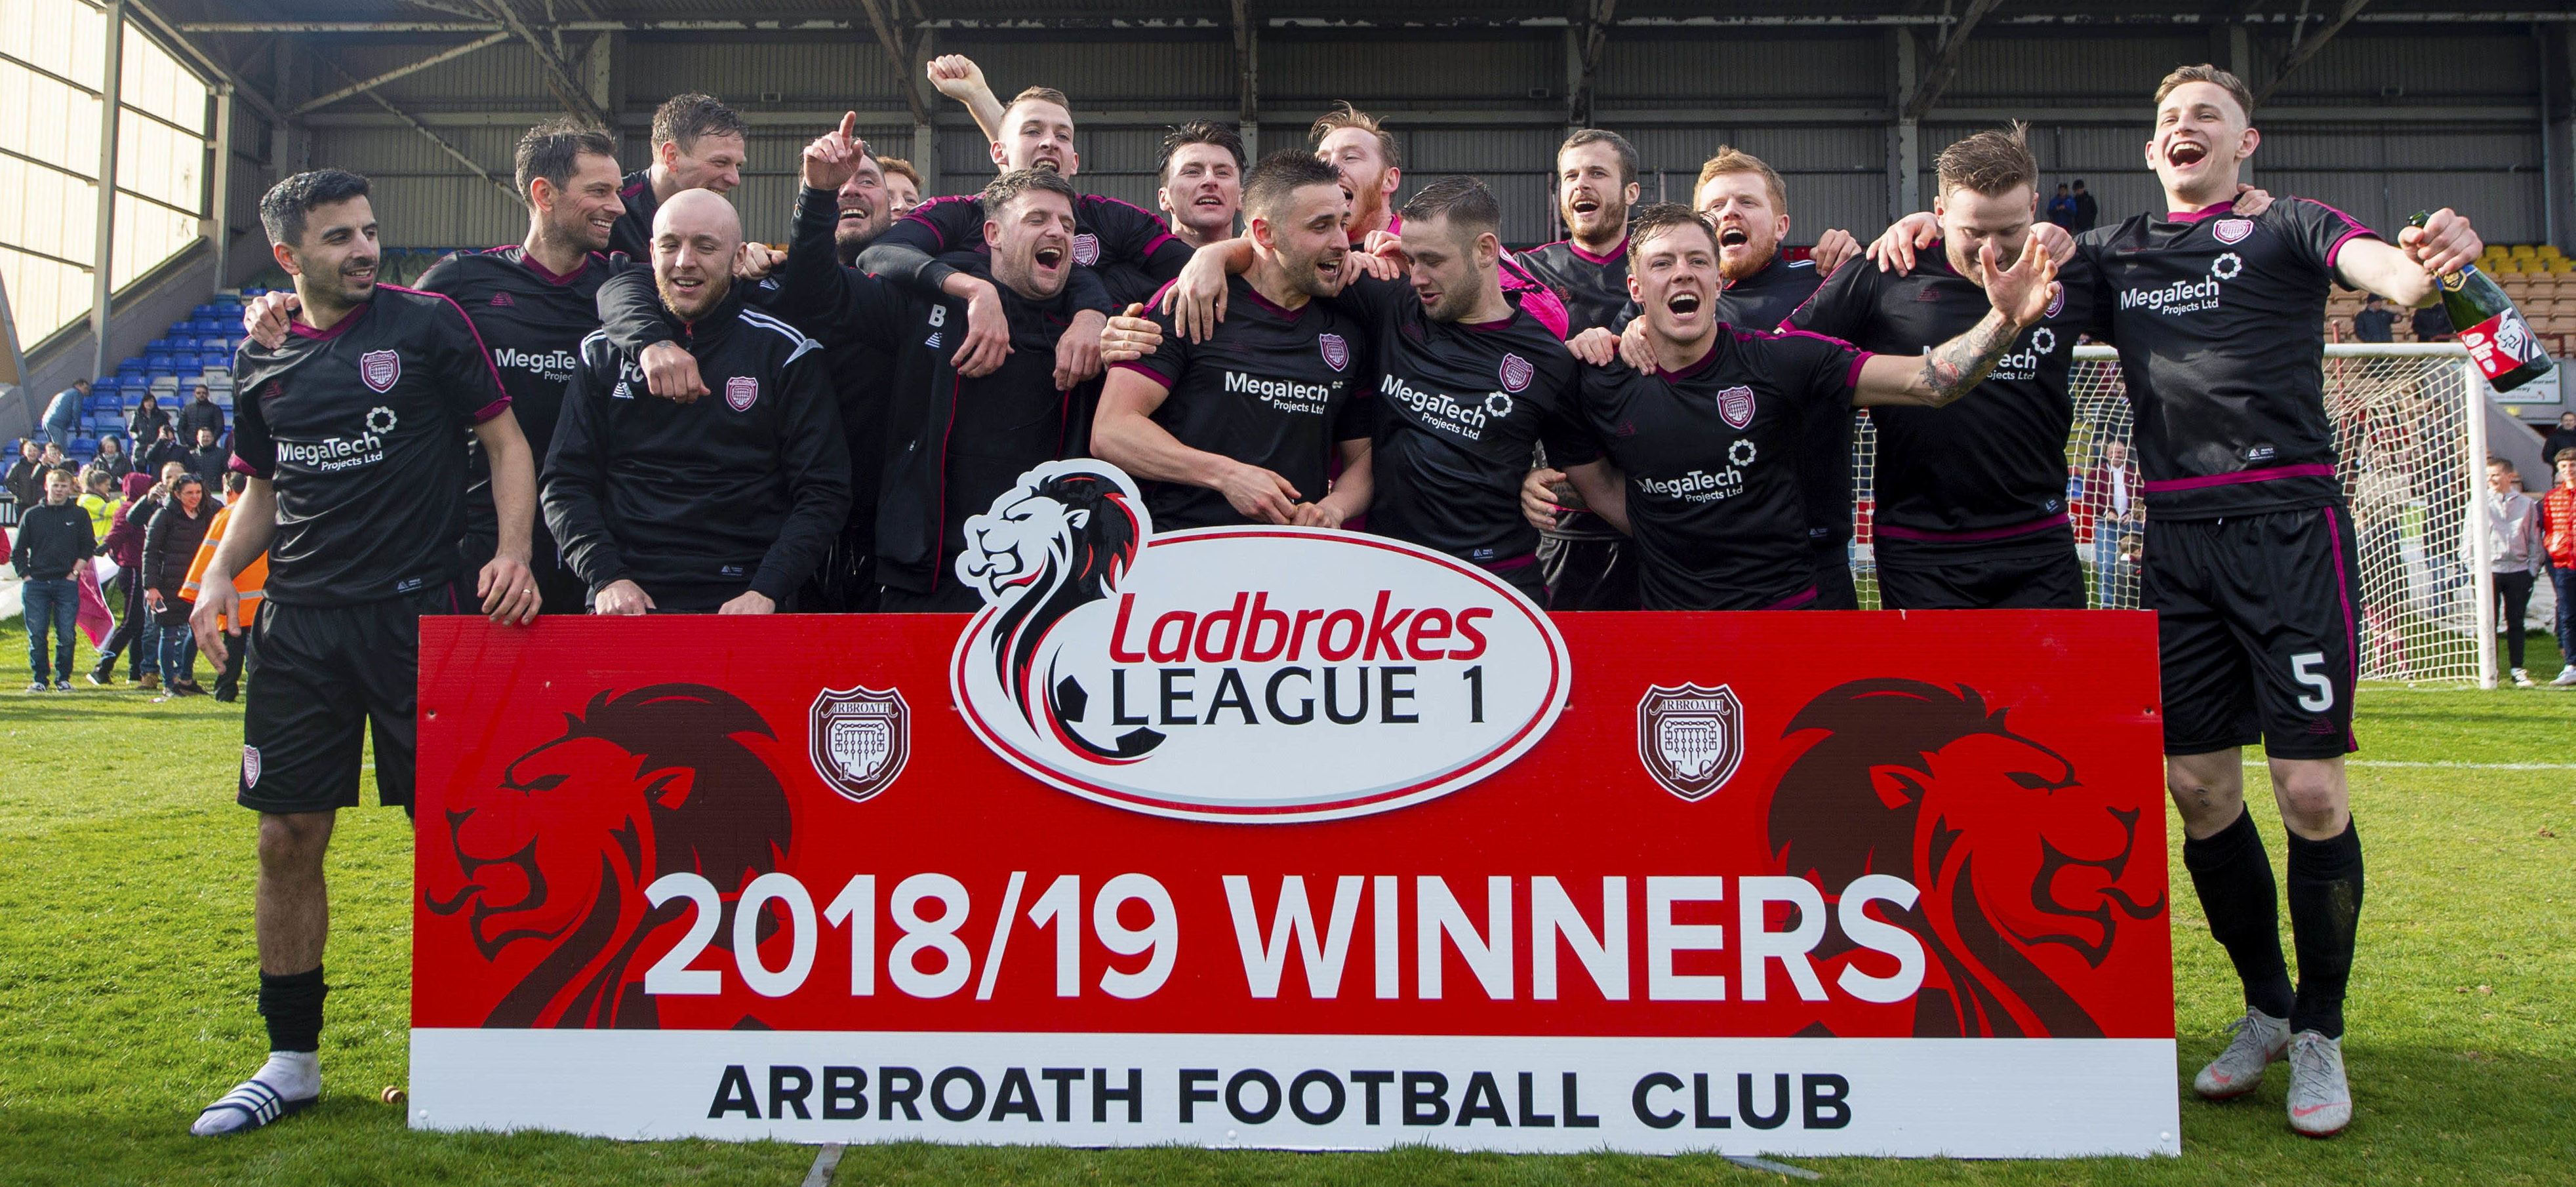 Arbroath are champions